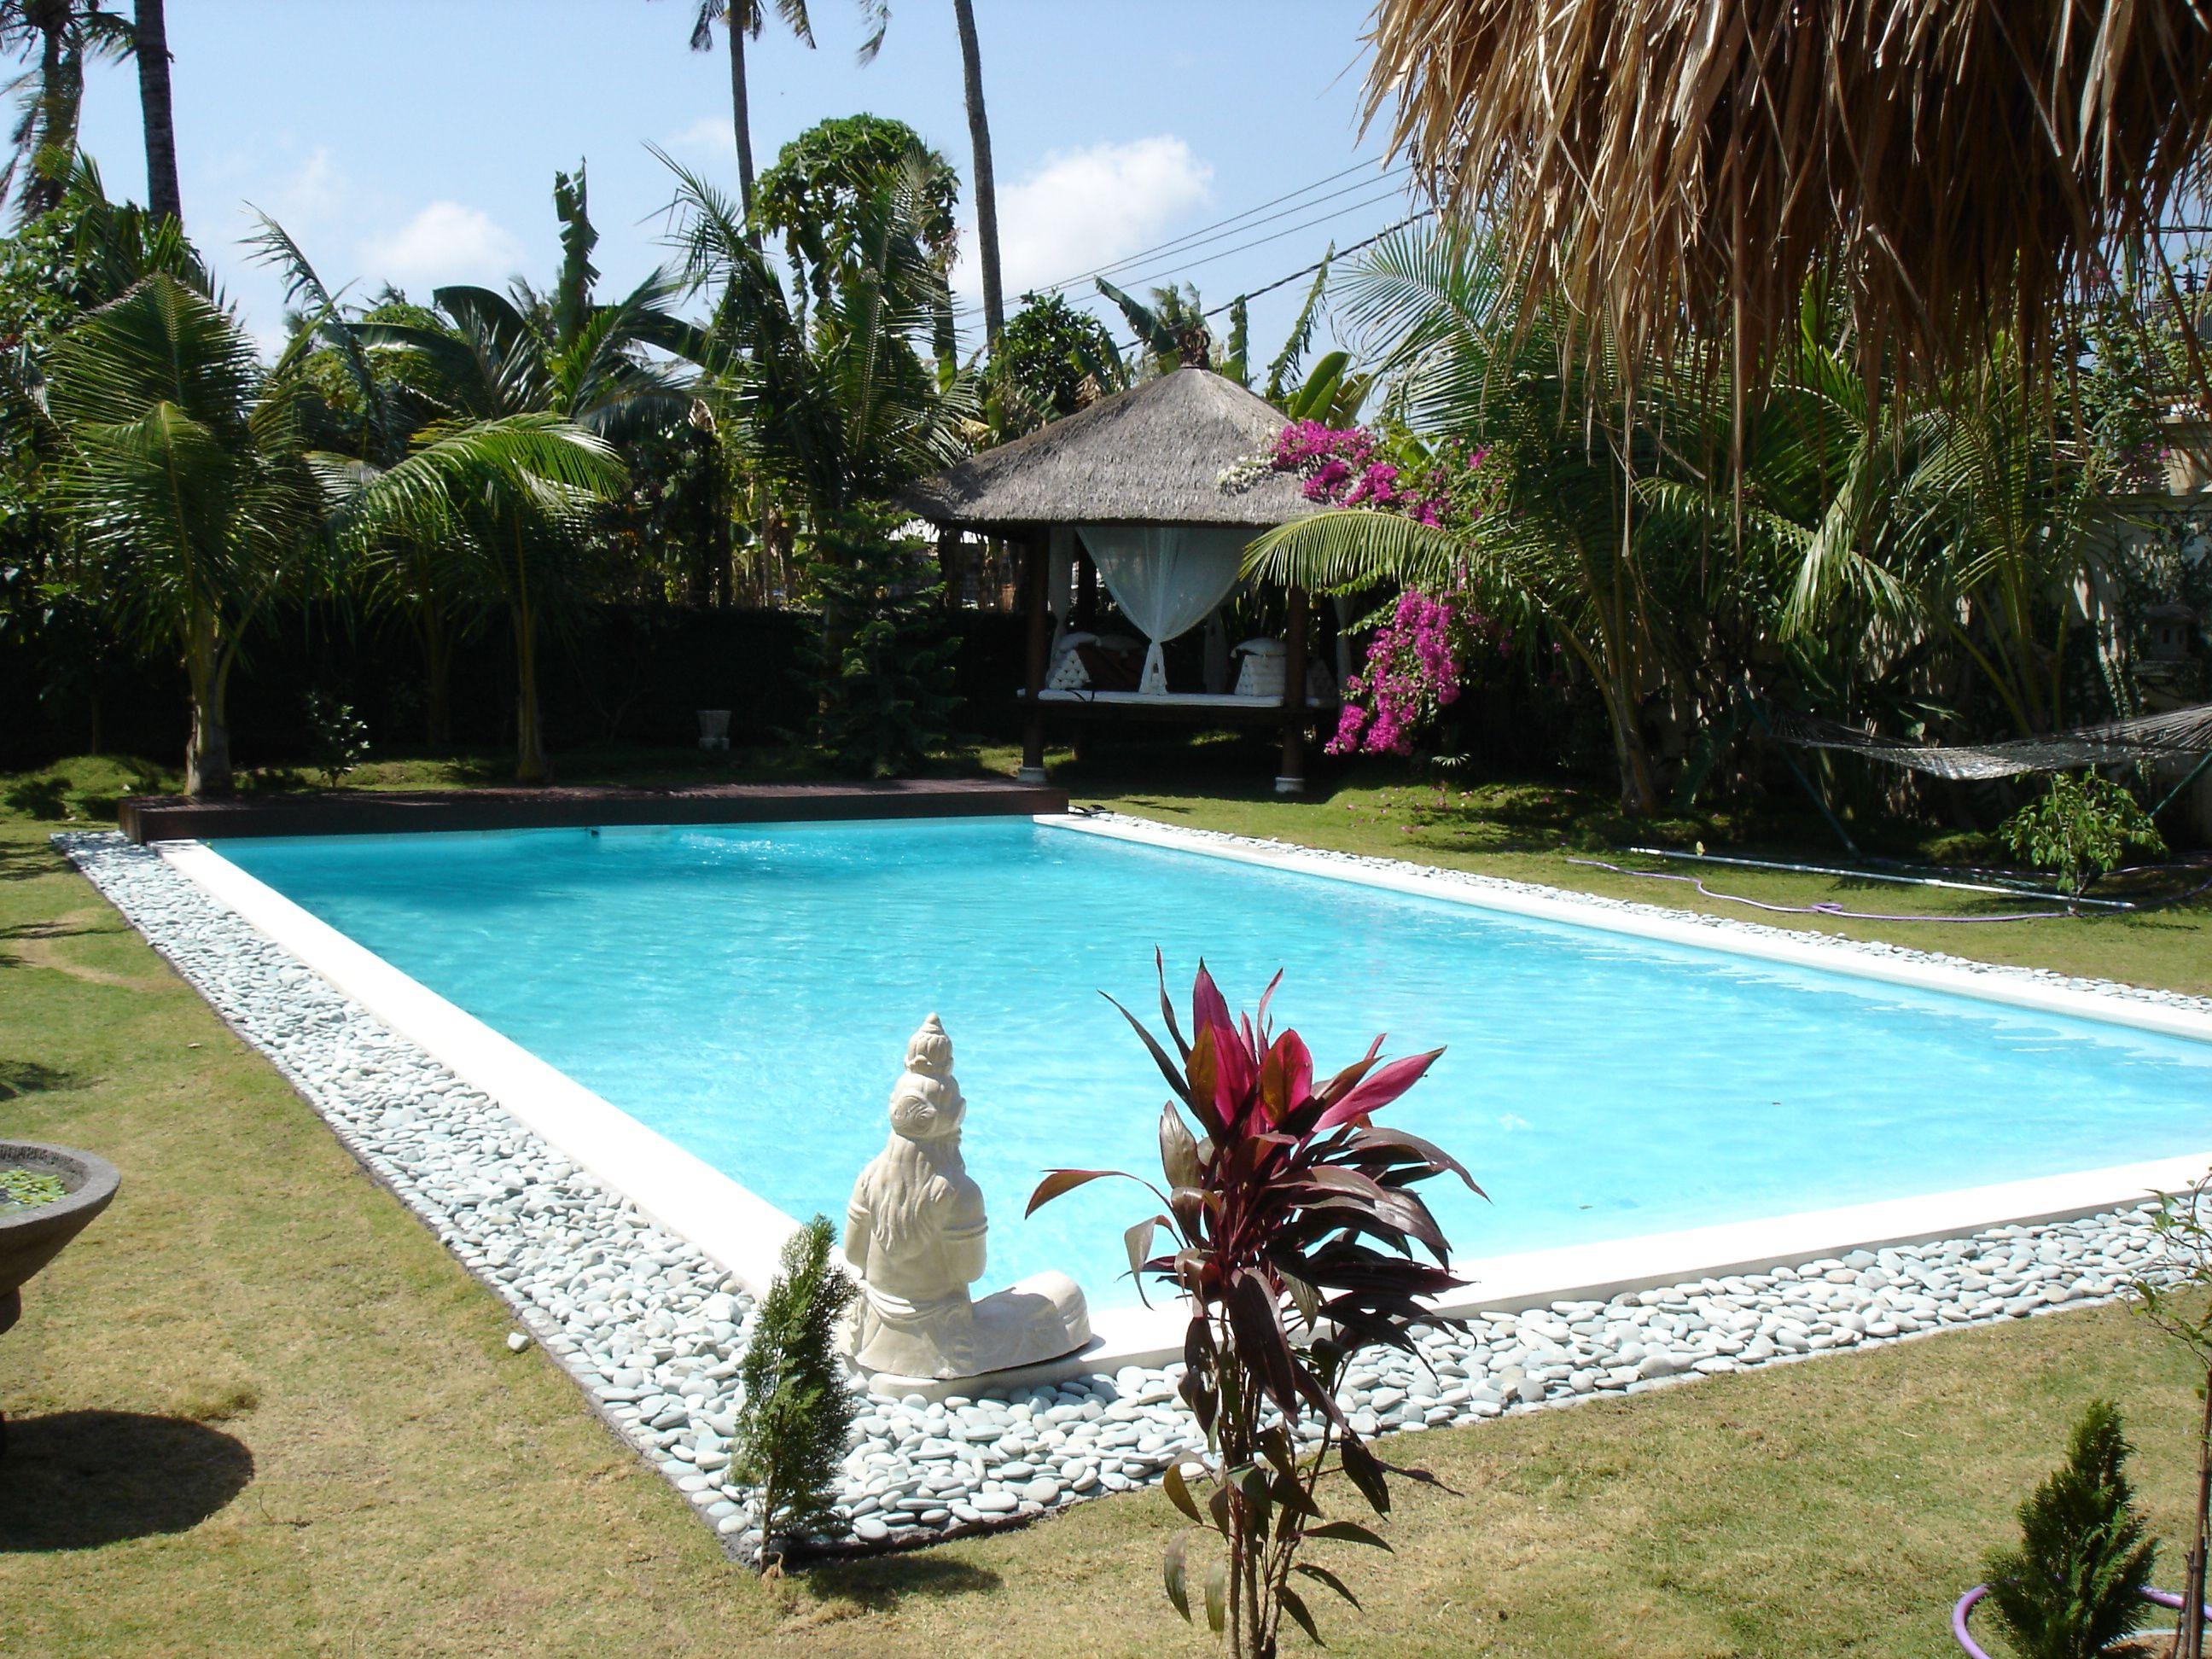 Desjoyaux Bali Pool Project Projects On Bali Island Pinterest